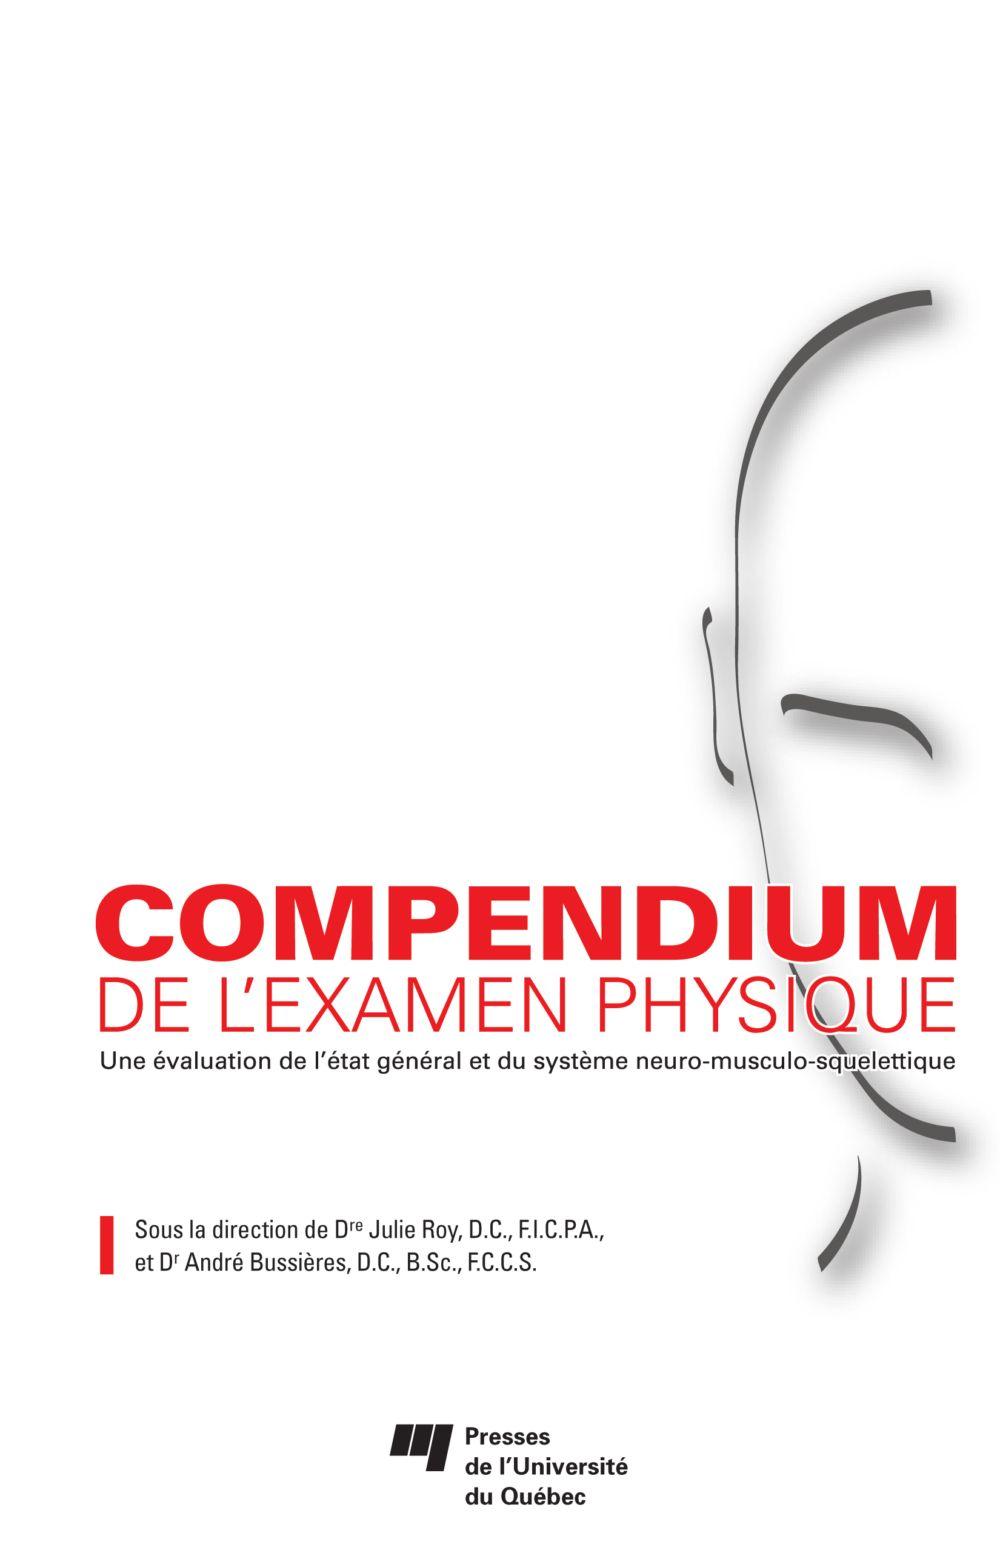 Compendium de l'examen physique